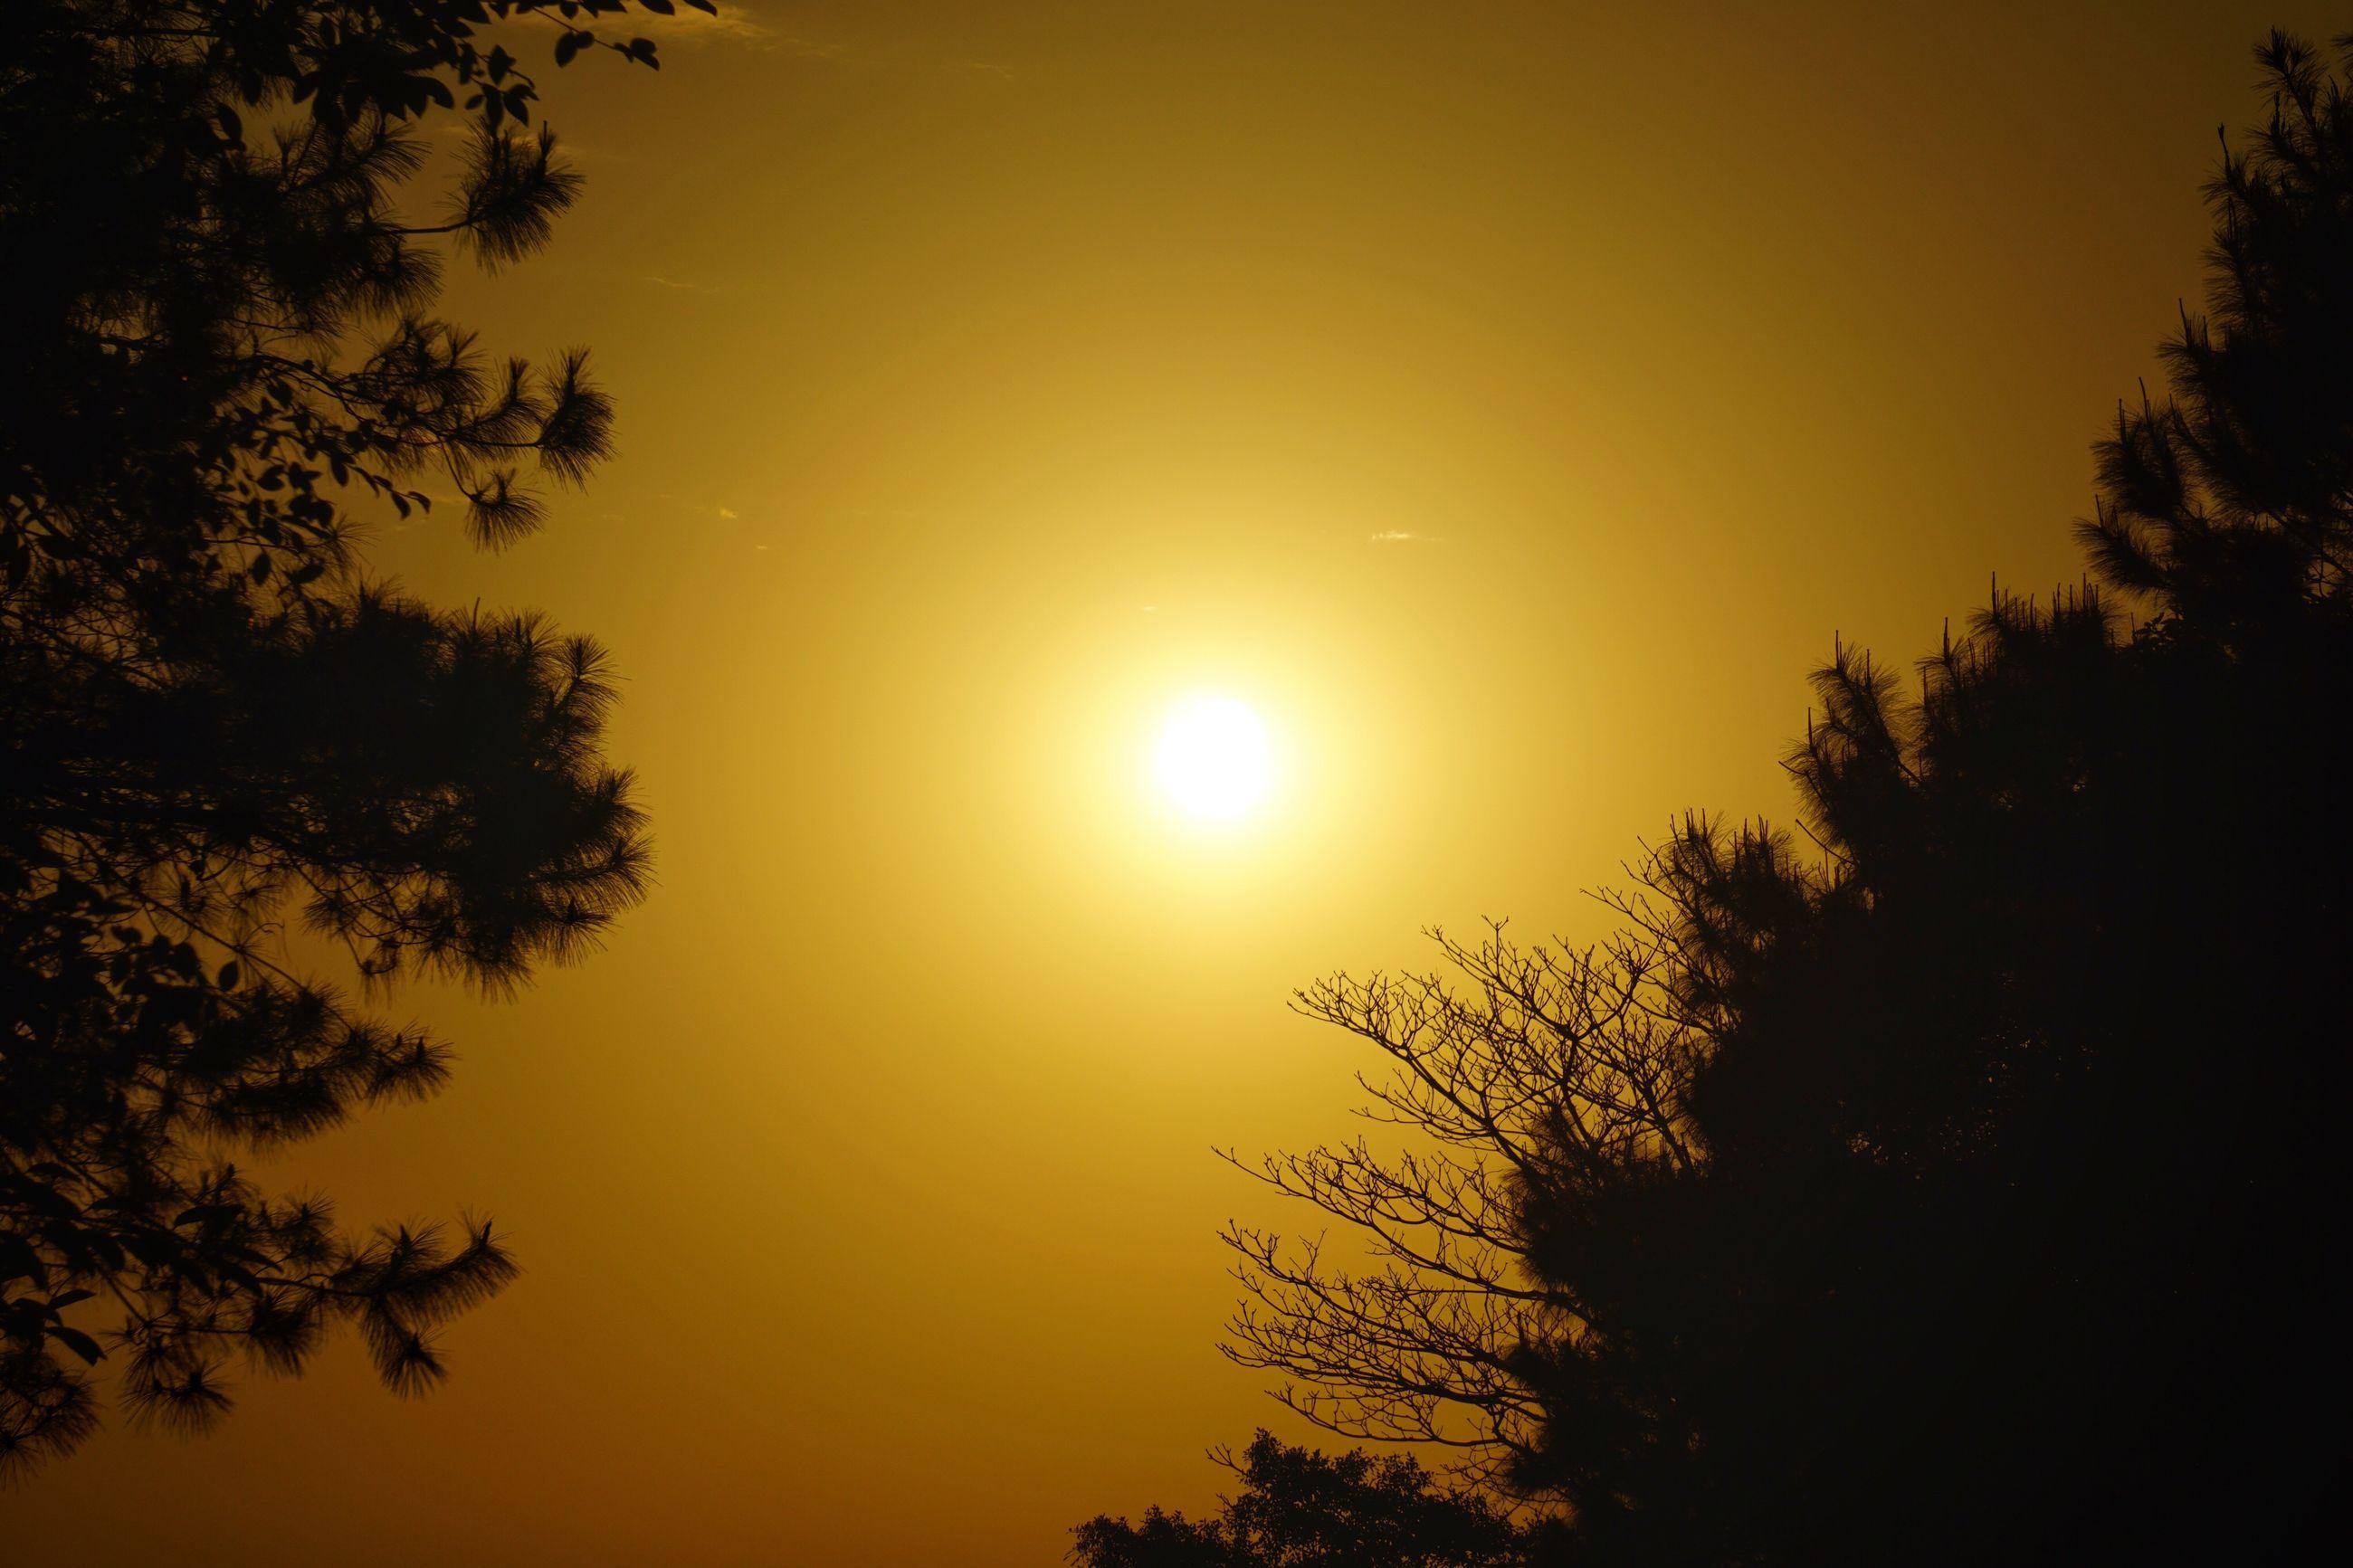 sunset, silhouette, tree, sun, tranquility, beauty in nature, tranquil scene, scenics, nature, sky, idyllic, orange color, growth, outdoors, no people, outline, non-urban scene, majestic, dark, sunbeam